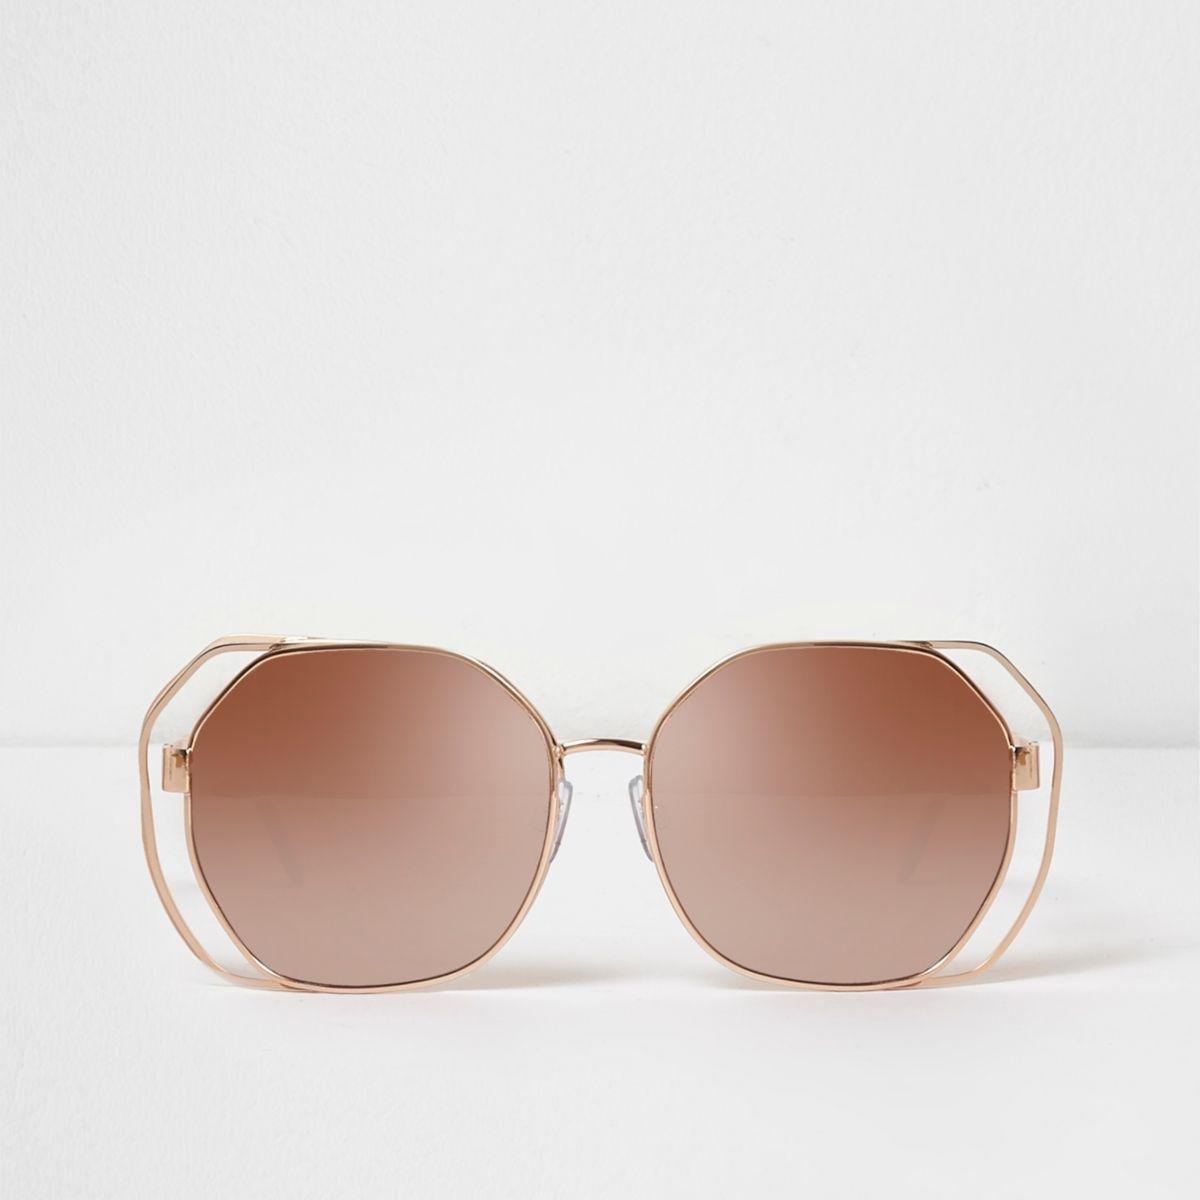 Womens Gold tone mirror lens square visor sunglasses River Island lpmCQ